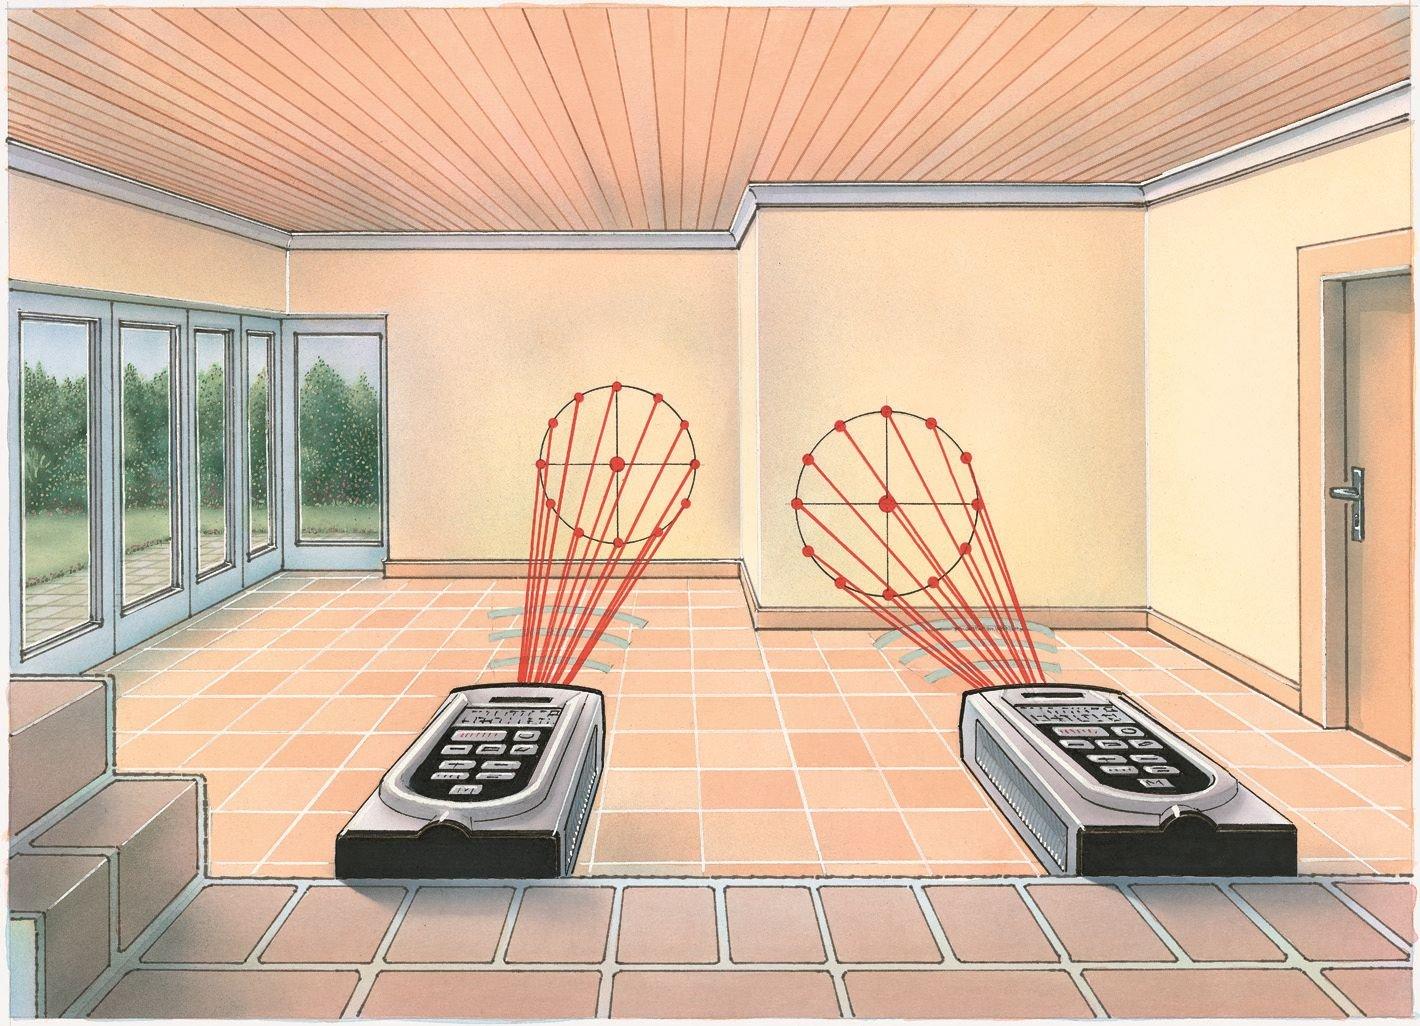 Ultraschall Entfernungsmesser Laserliner Metermaster Plus : Laserliner ultraschallentfernungsmesser metermaster pro classic